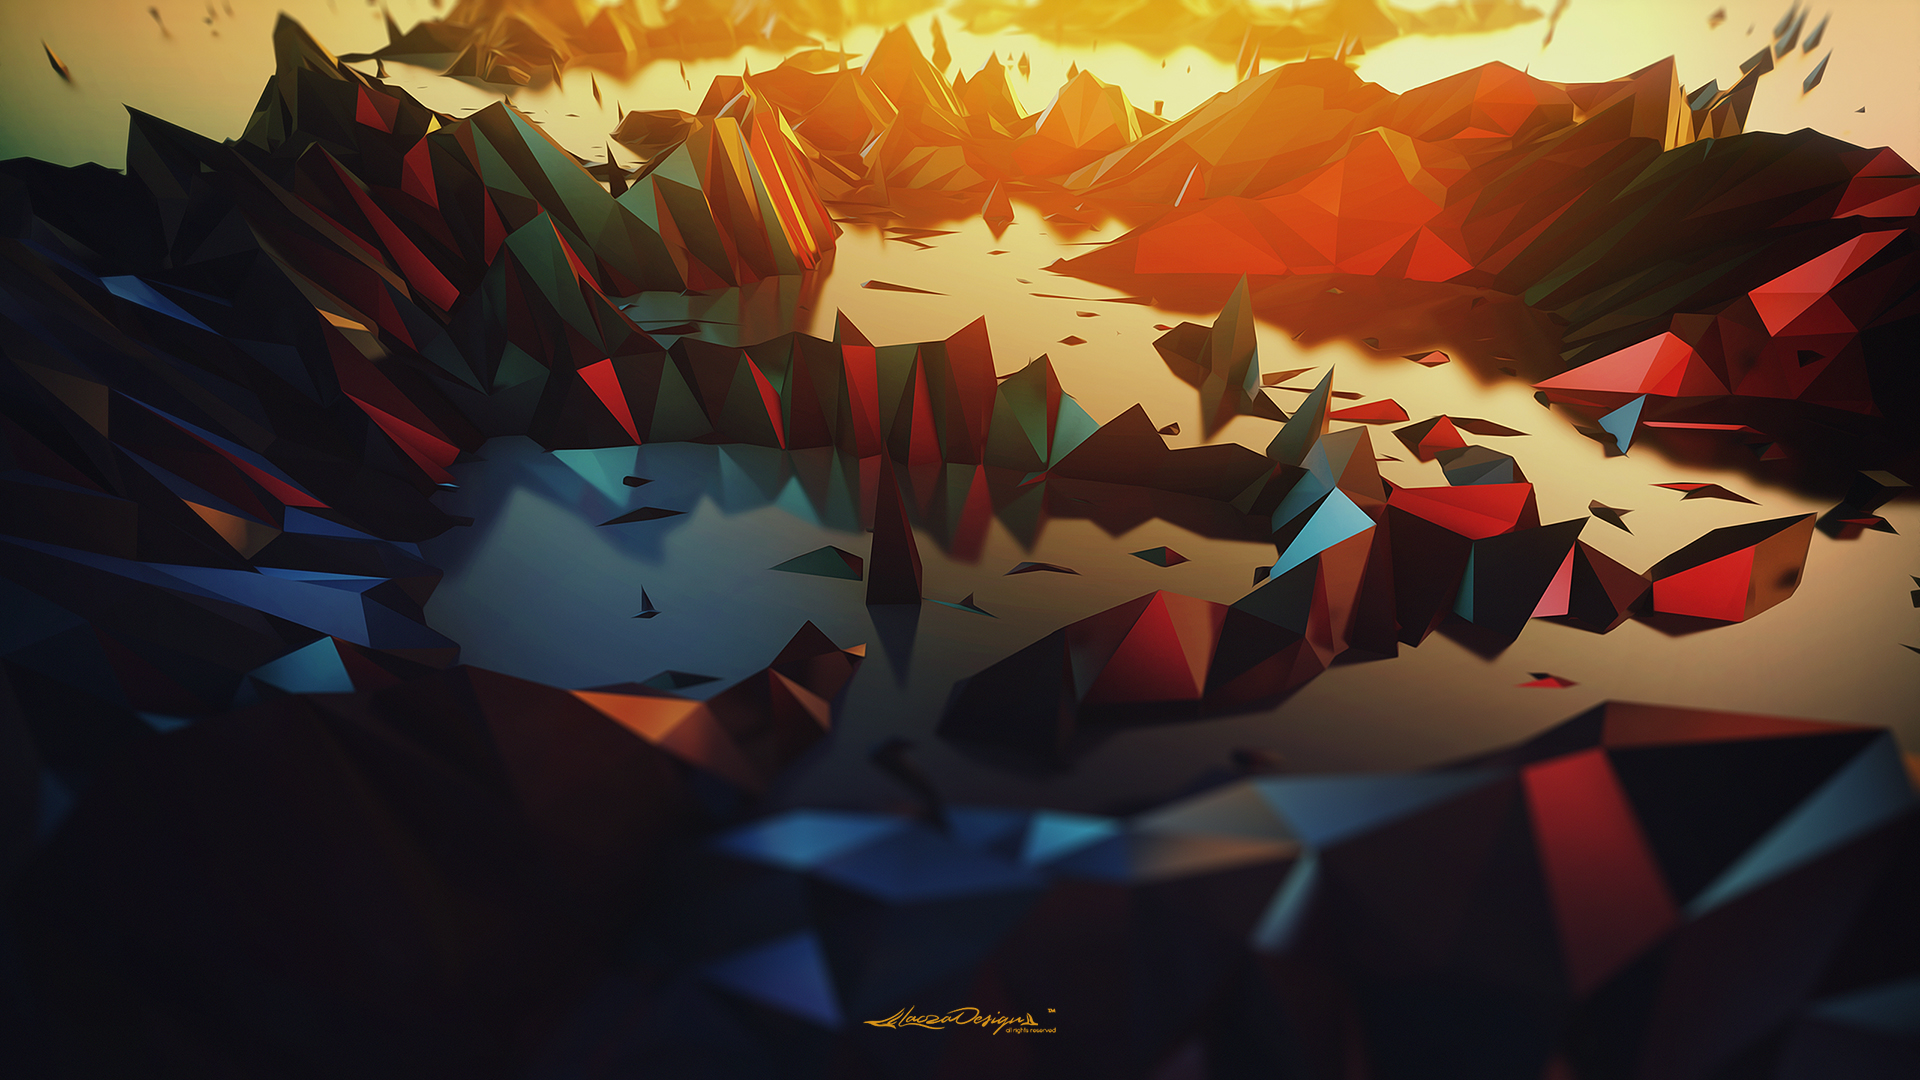 Abstract Geometric Digital Art - HD Wallpaper